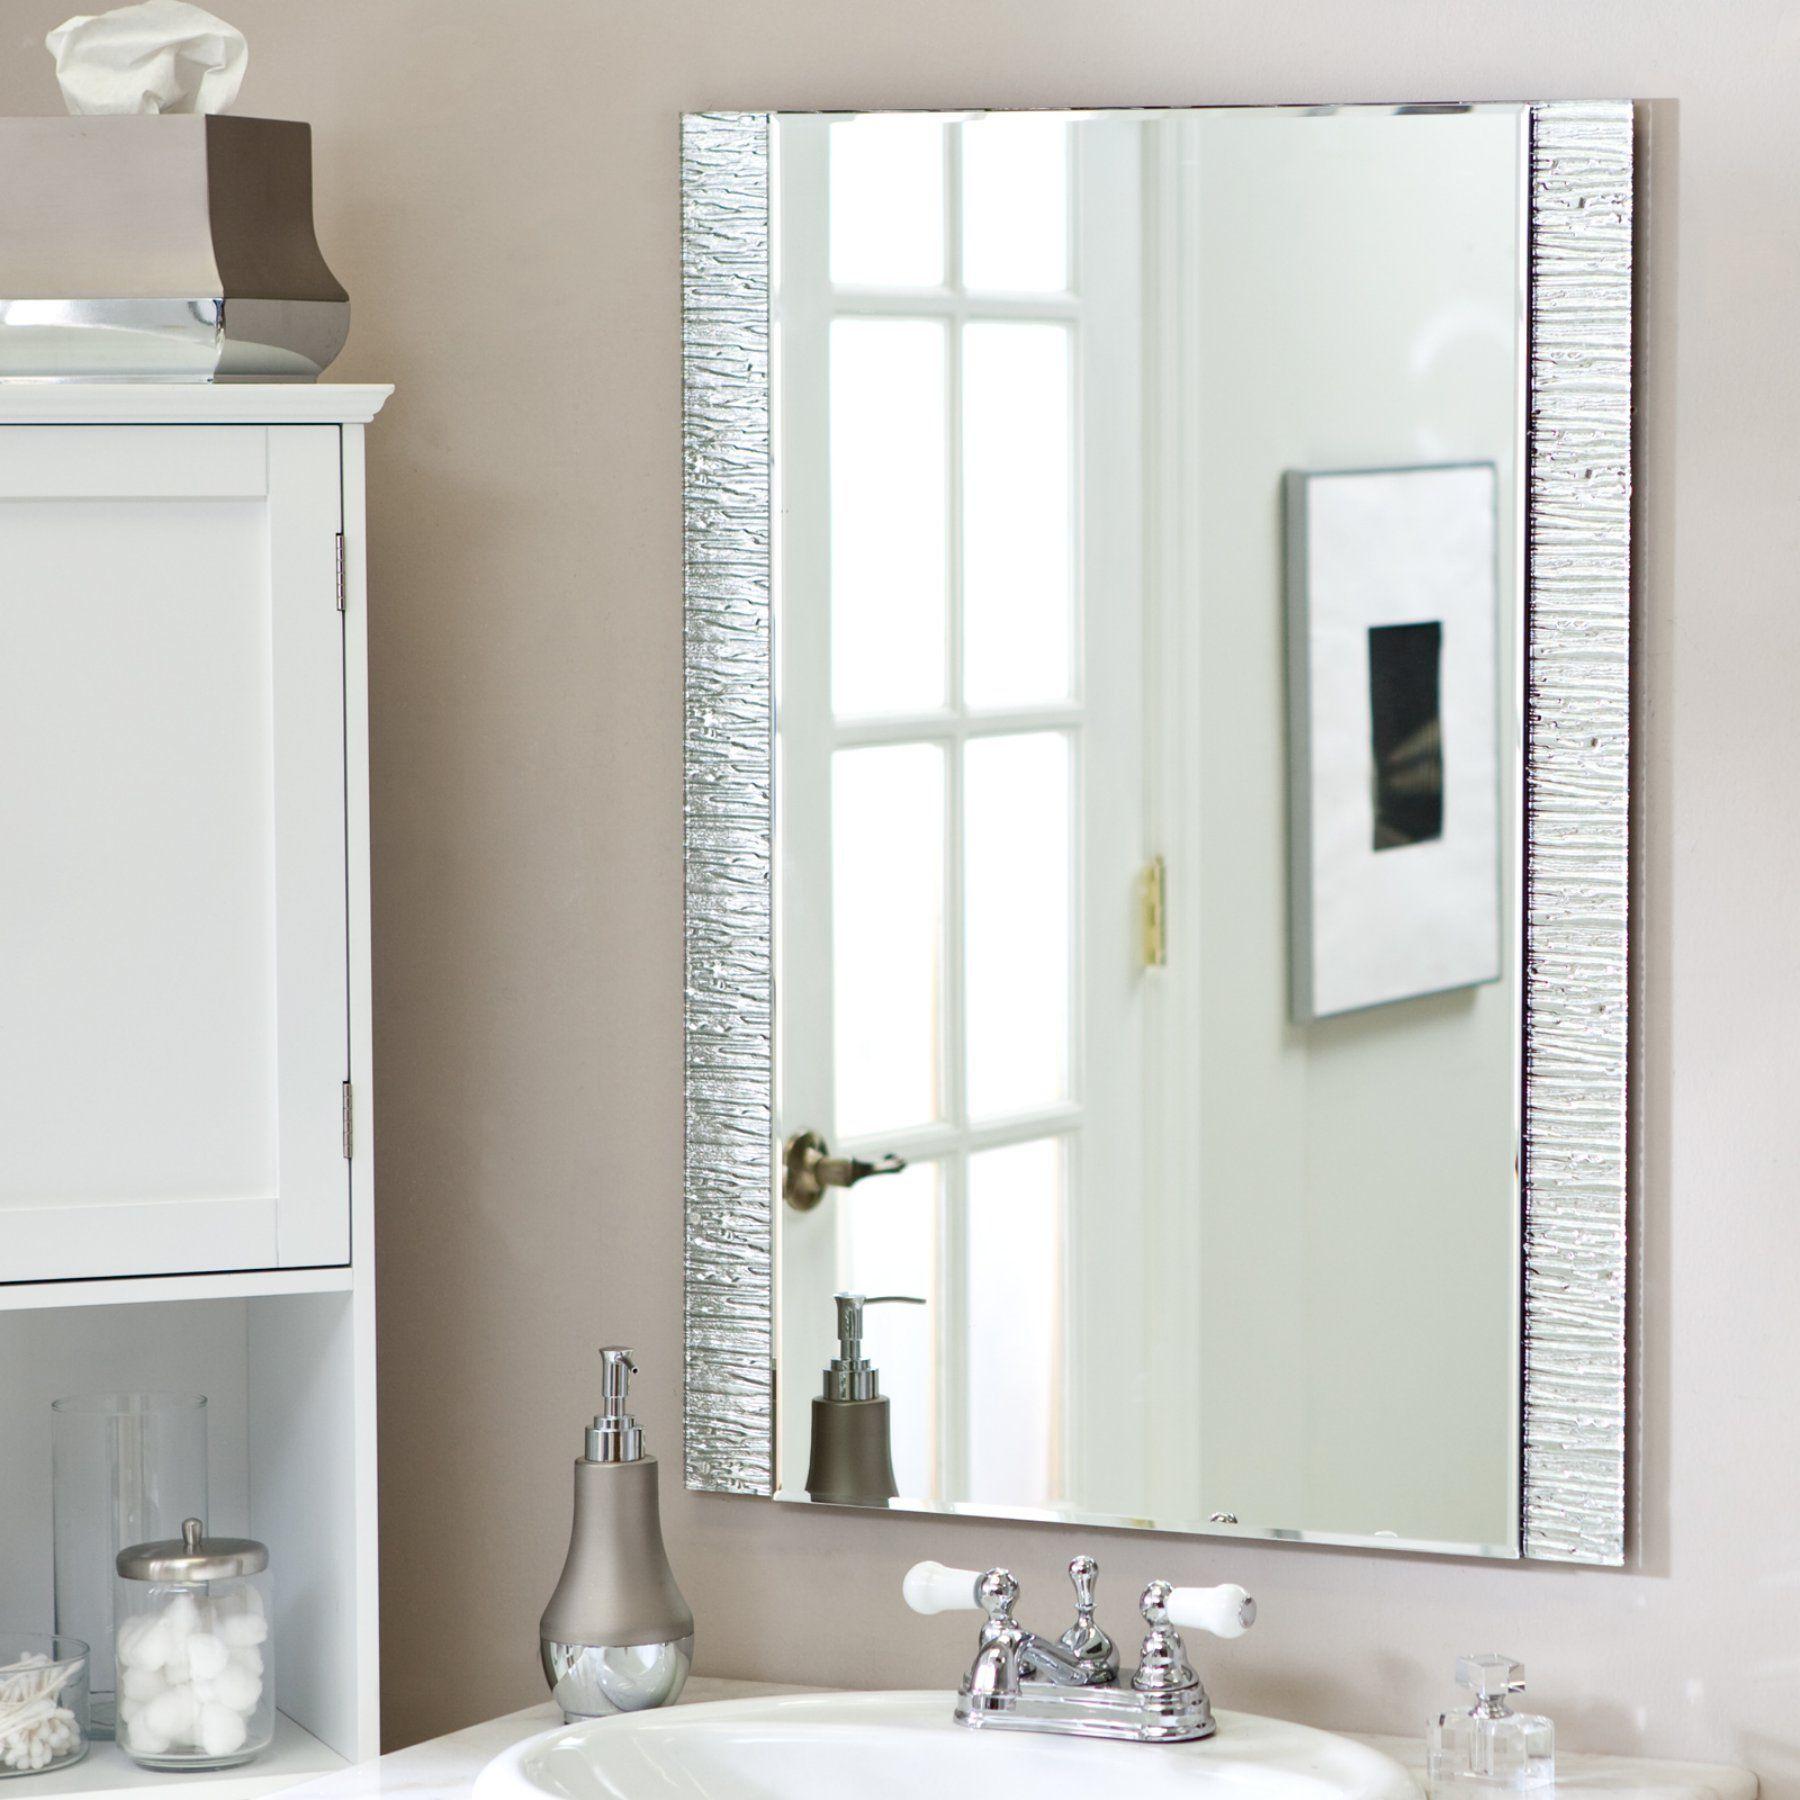 Décor Wonderland Frameless Molten Wall Mirror - 23.5W x 31.5H in ...